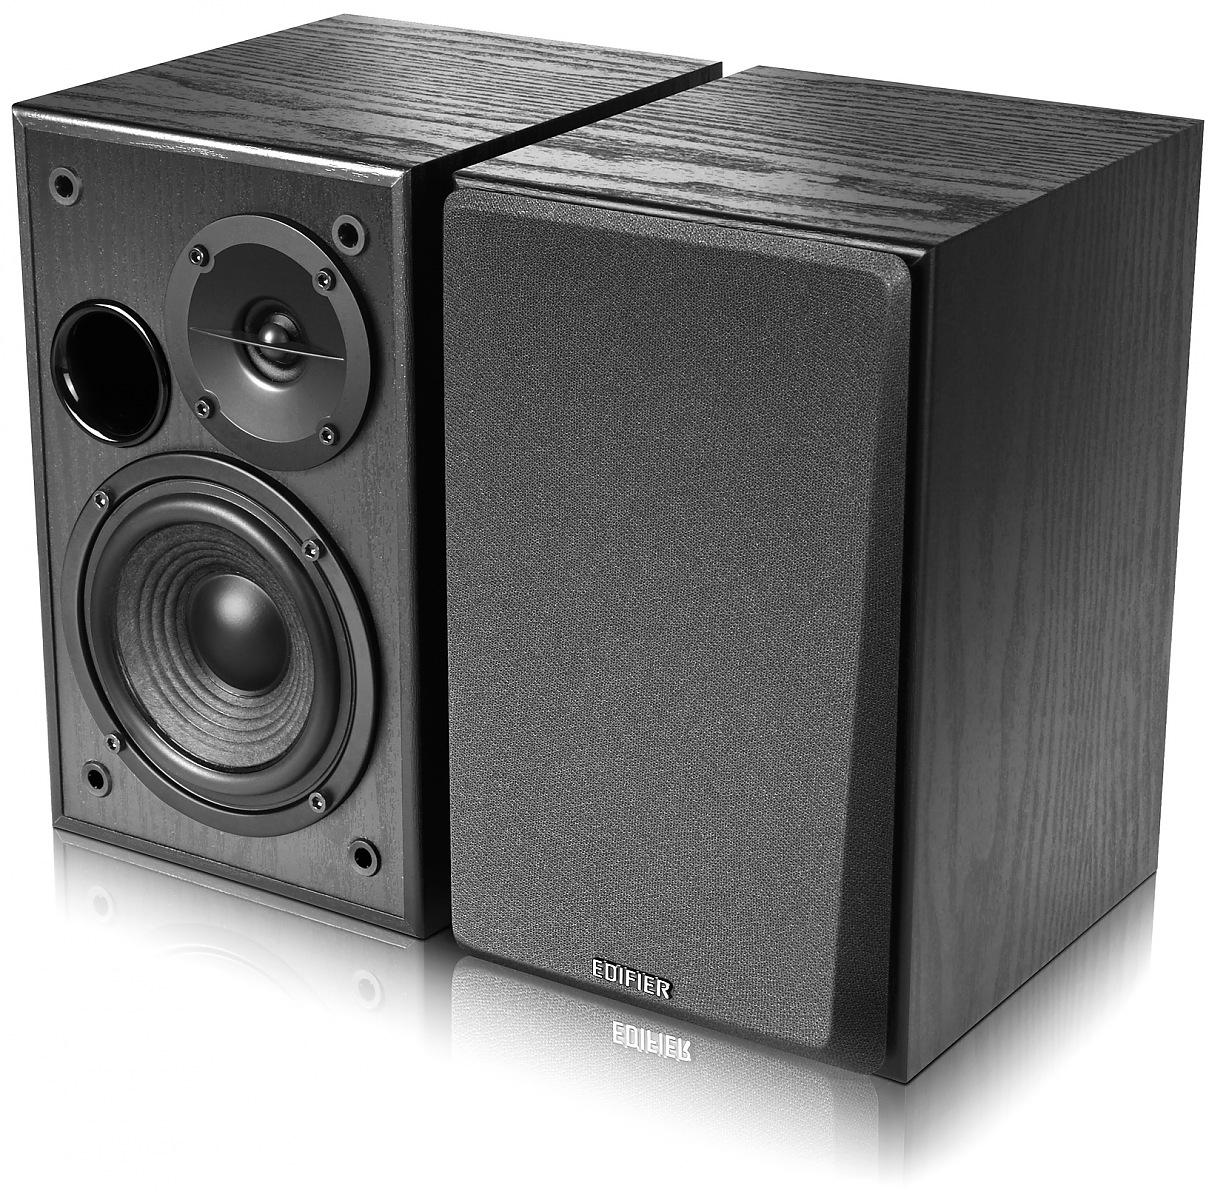 Edifier R1100 akustiskā sistēma